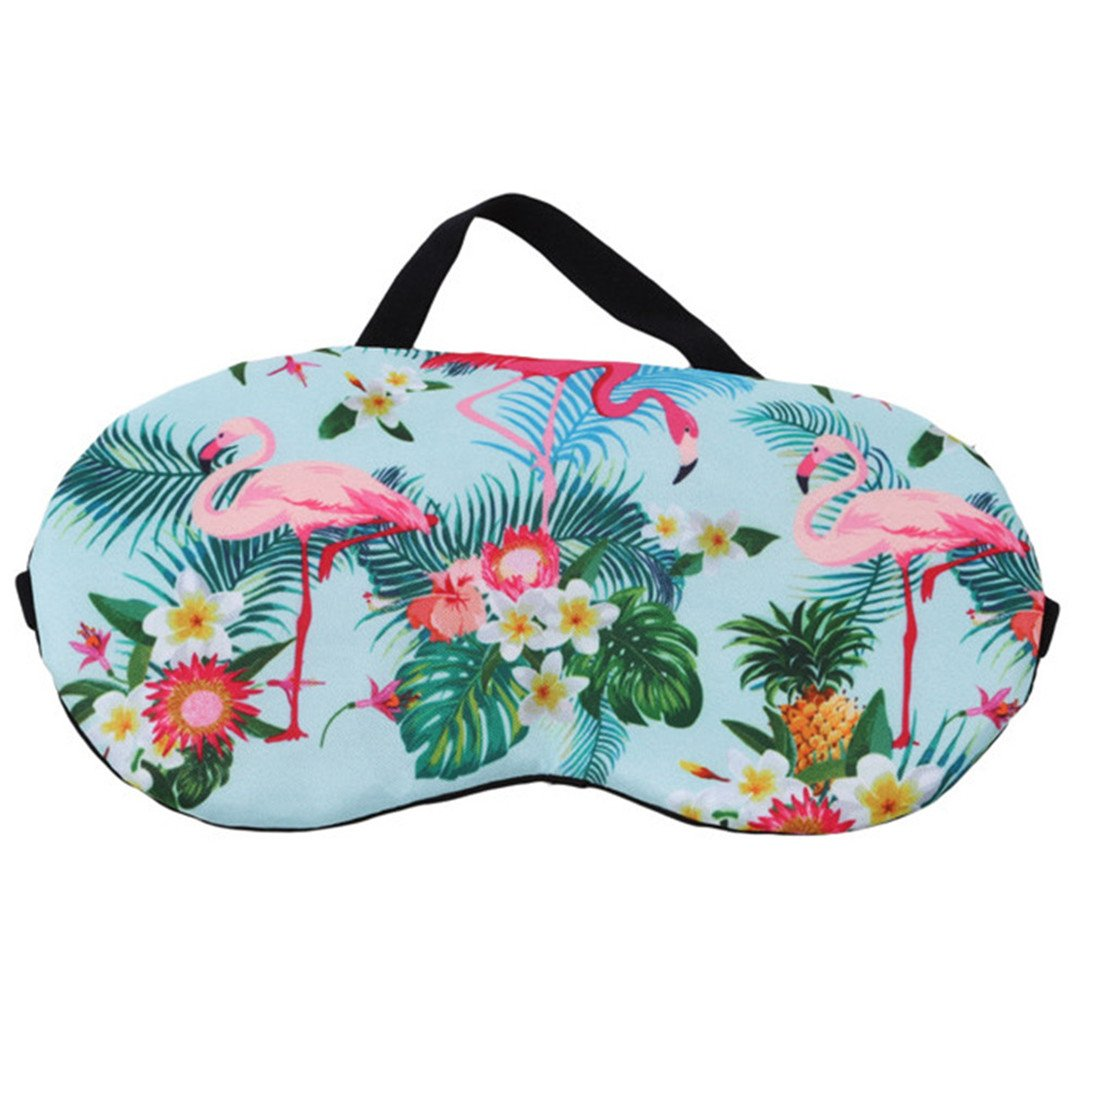 UNKE Flamingo Pattern Sleeping Eye Mask Blindfold Relax Sleep Travel Light Blocking Eye Shade,Green